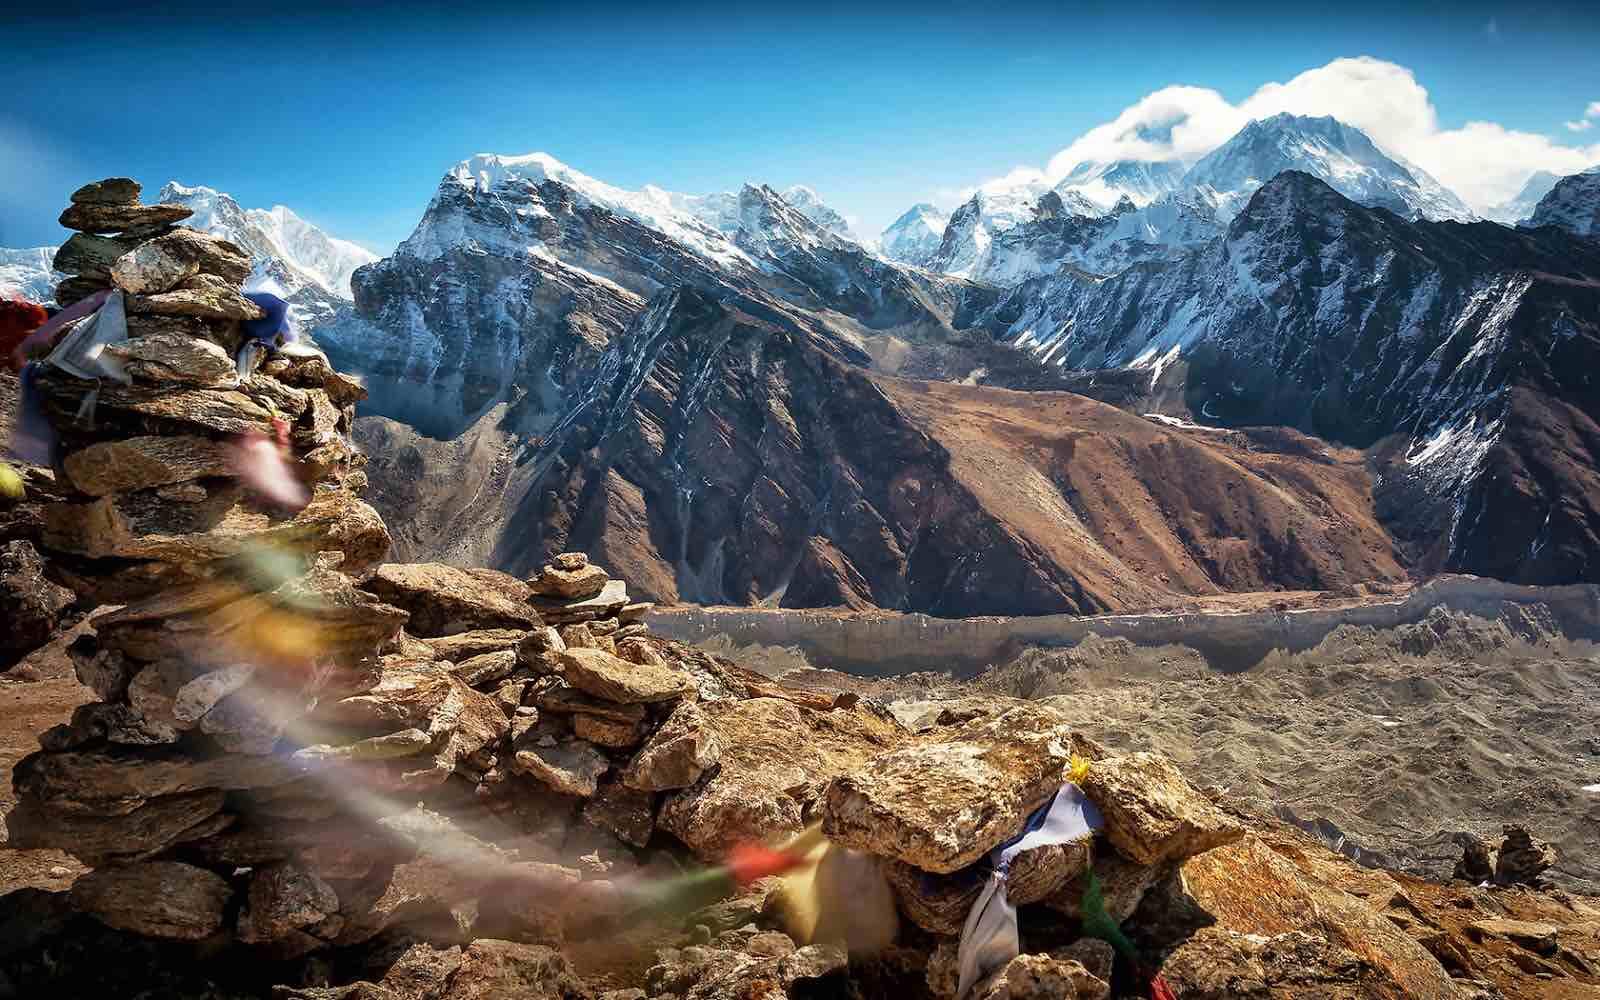 Trekking in Bhutan - AspirantSG